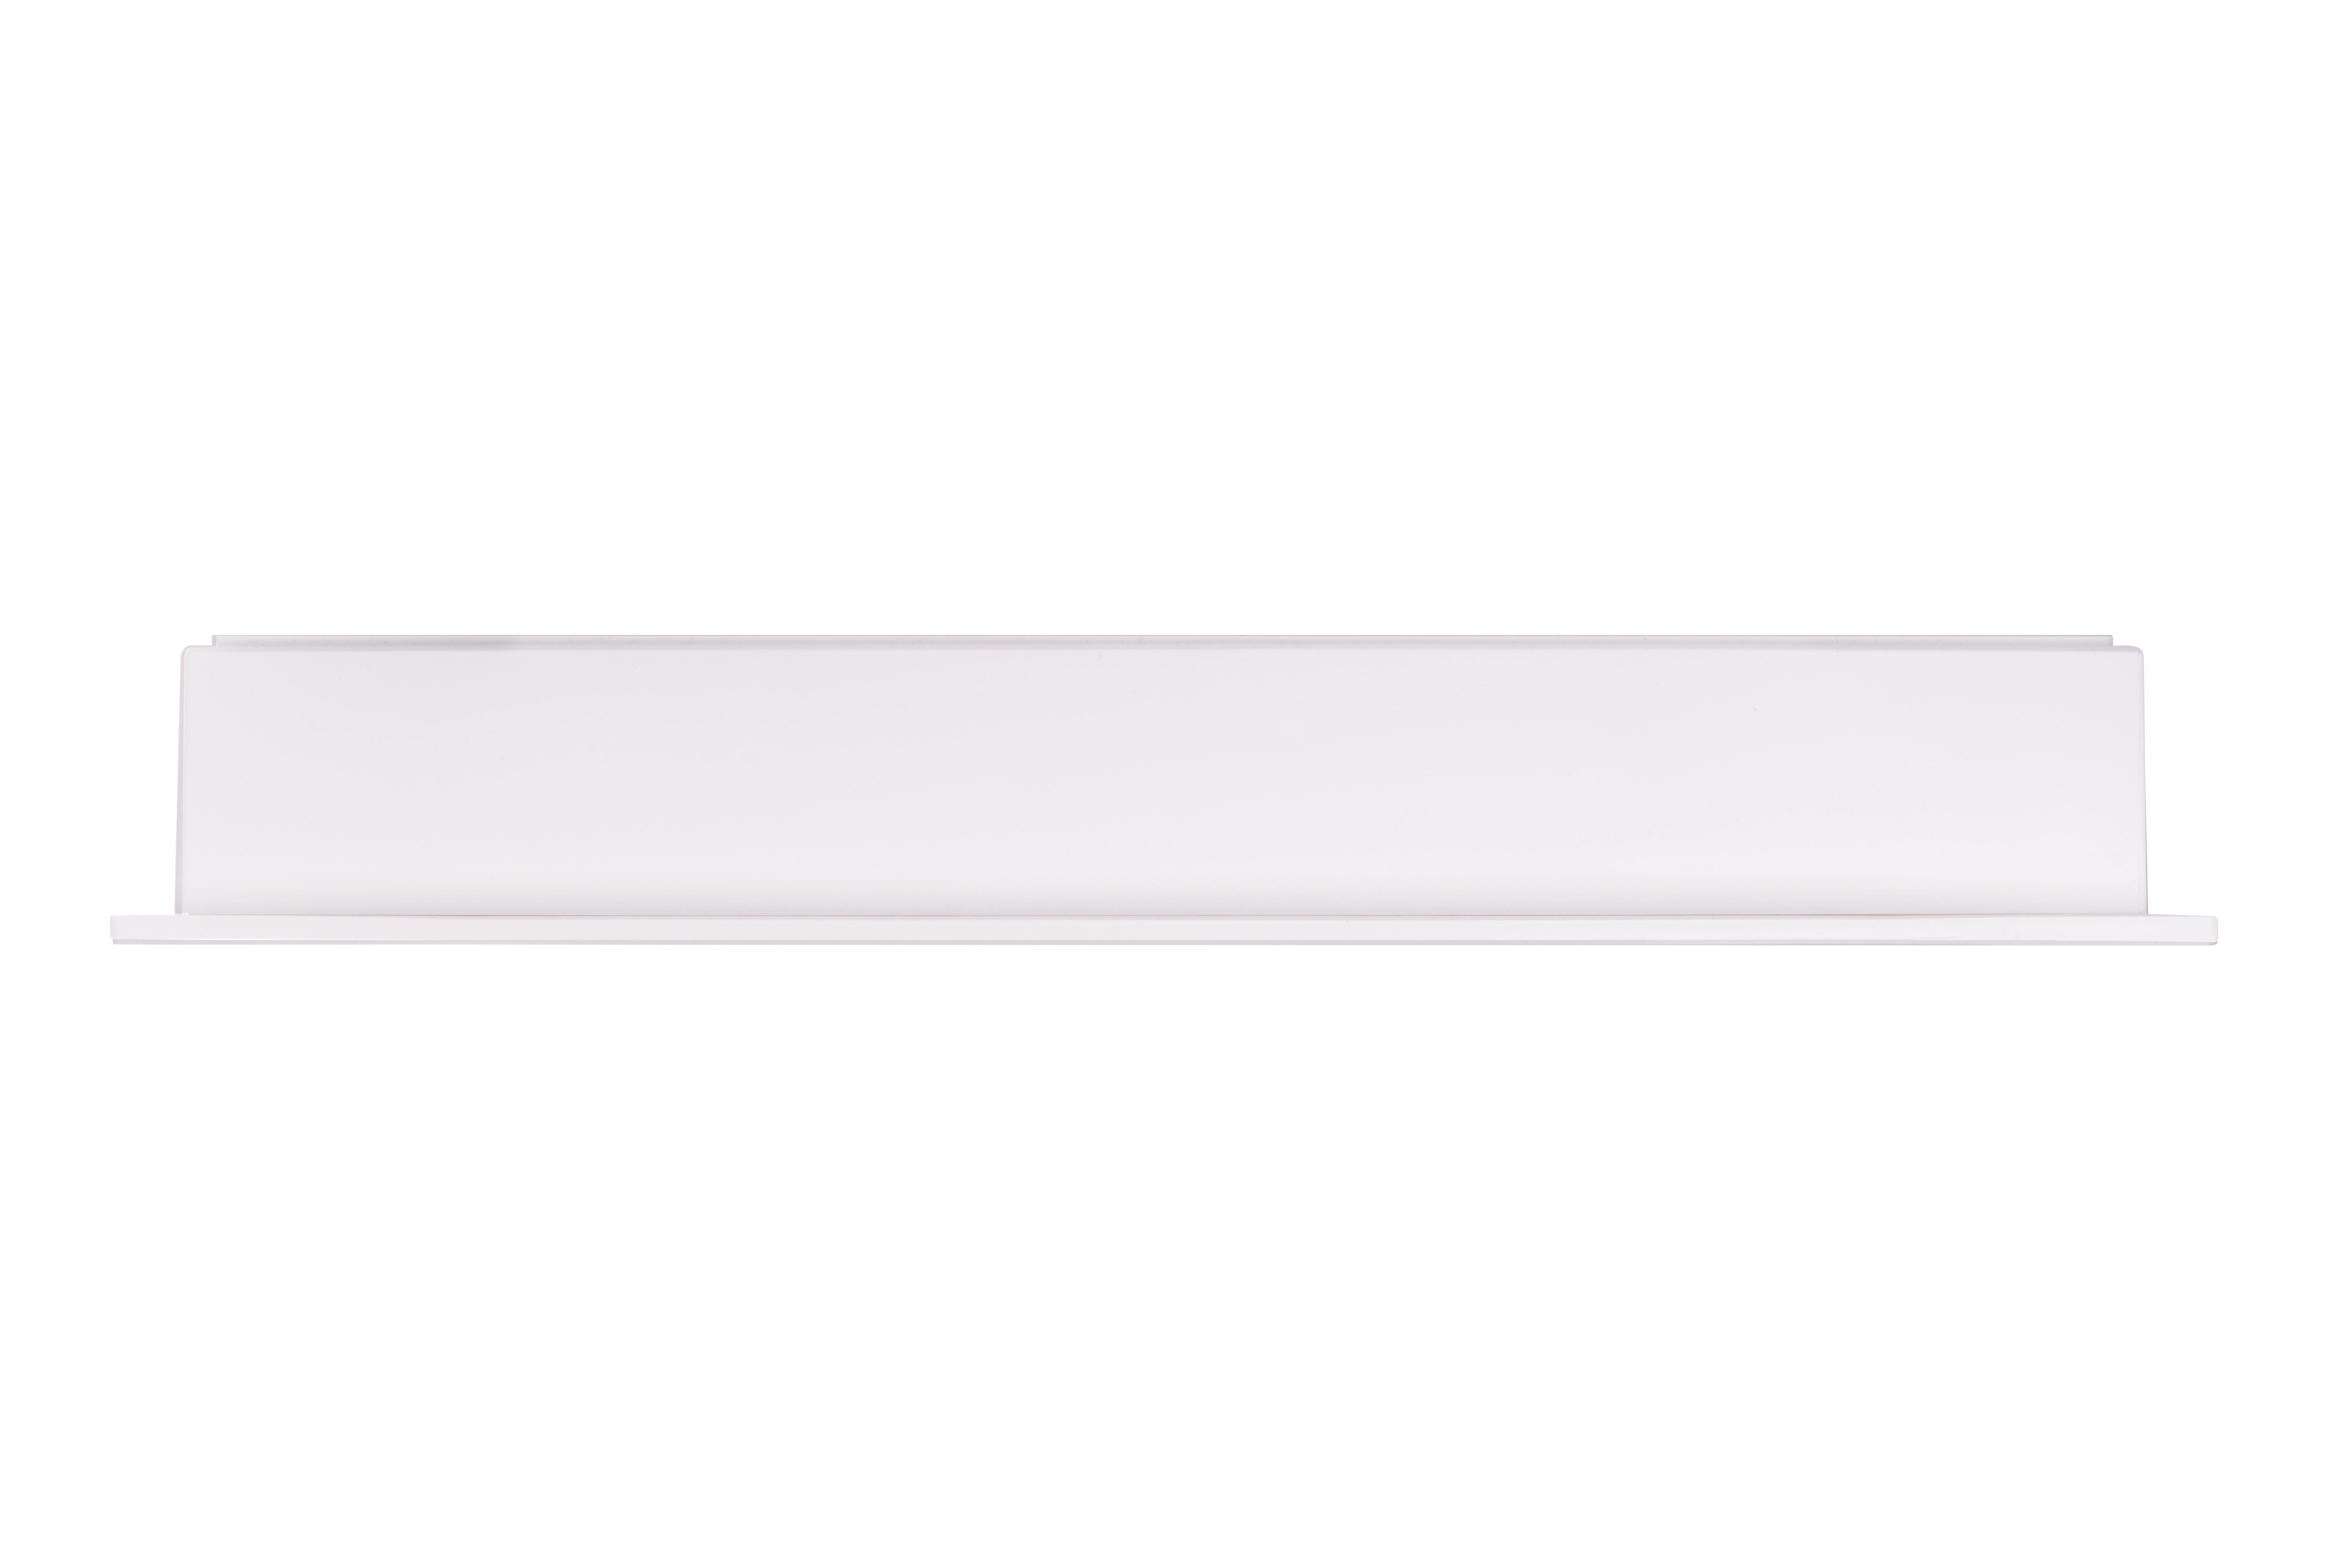 Lampa emergenta led Intelight 94525   2h nementinut test automat 5